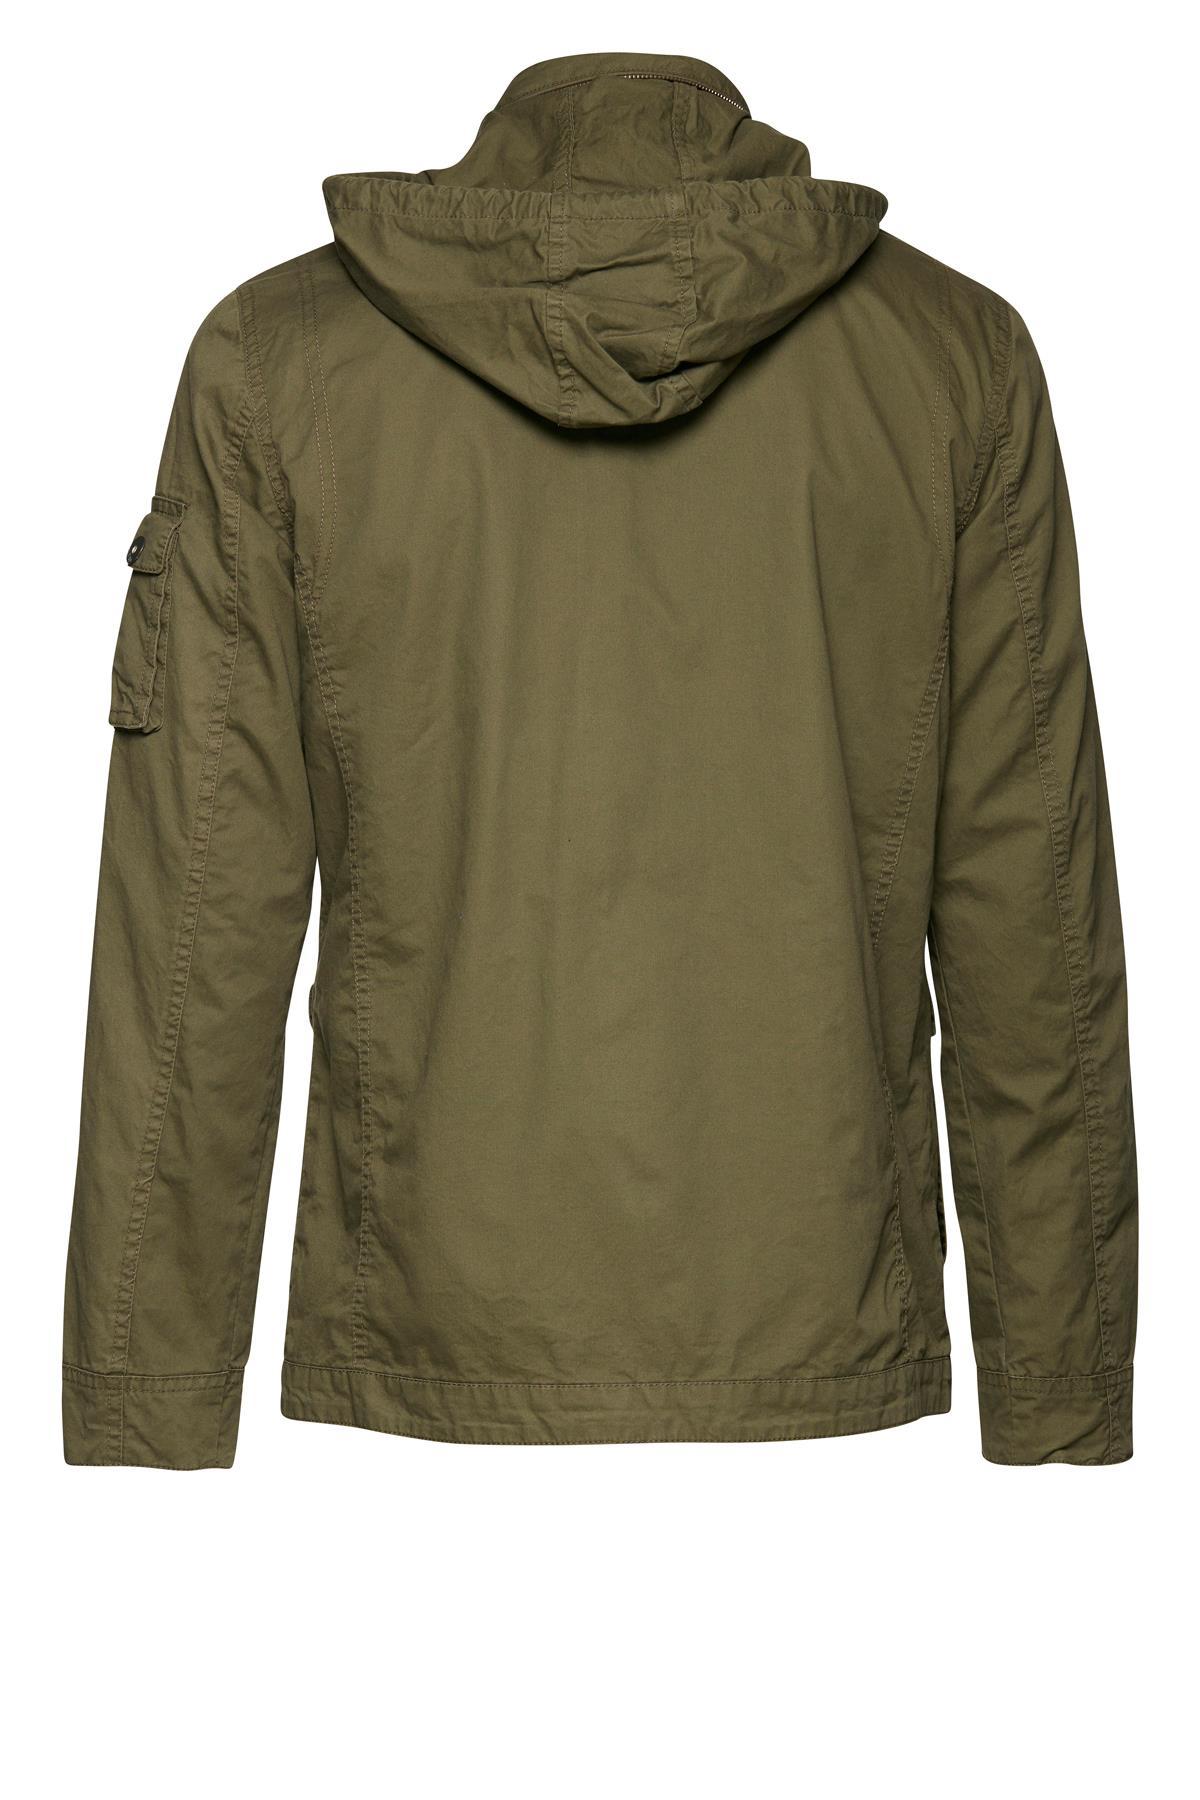 Støvet grøn Overtøj – Køb Støvet grøn Overtøj fra str. S-XXL her